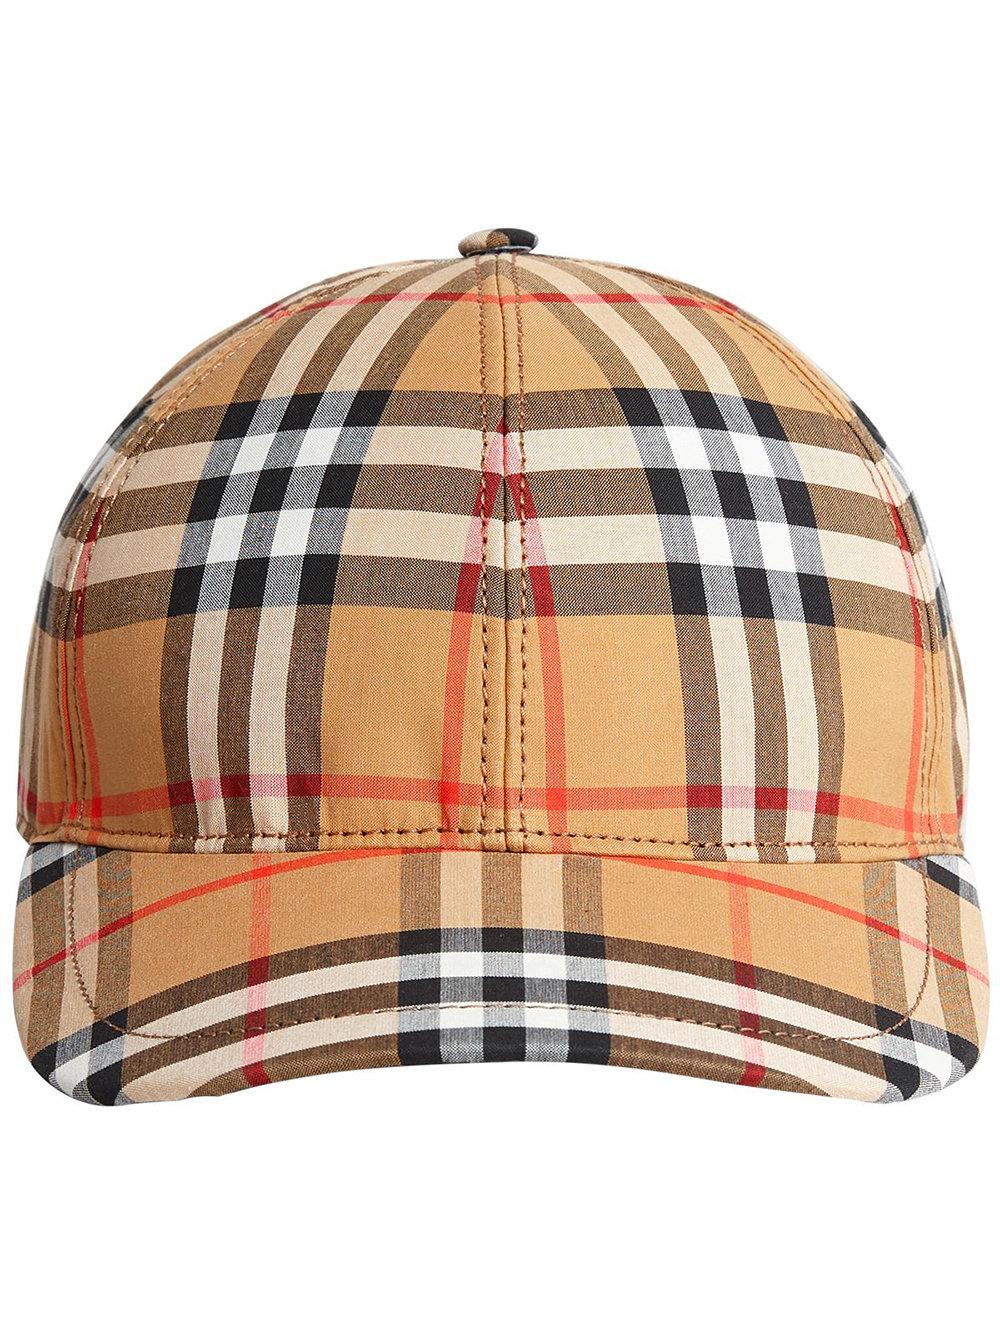 Burberry Vintage Check Baseball Cap - Neutrals - Glami.cz fa2e4123fc